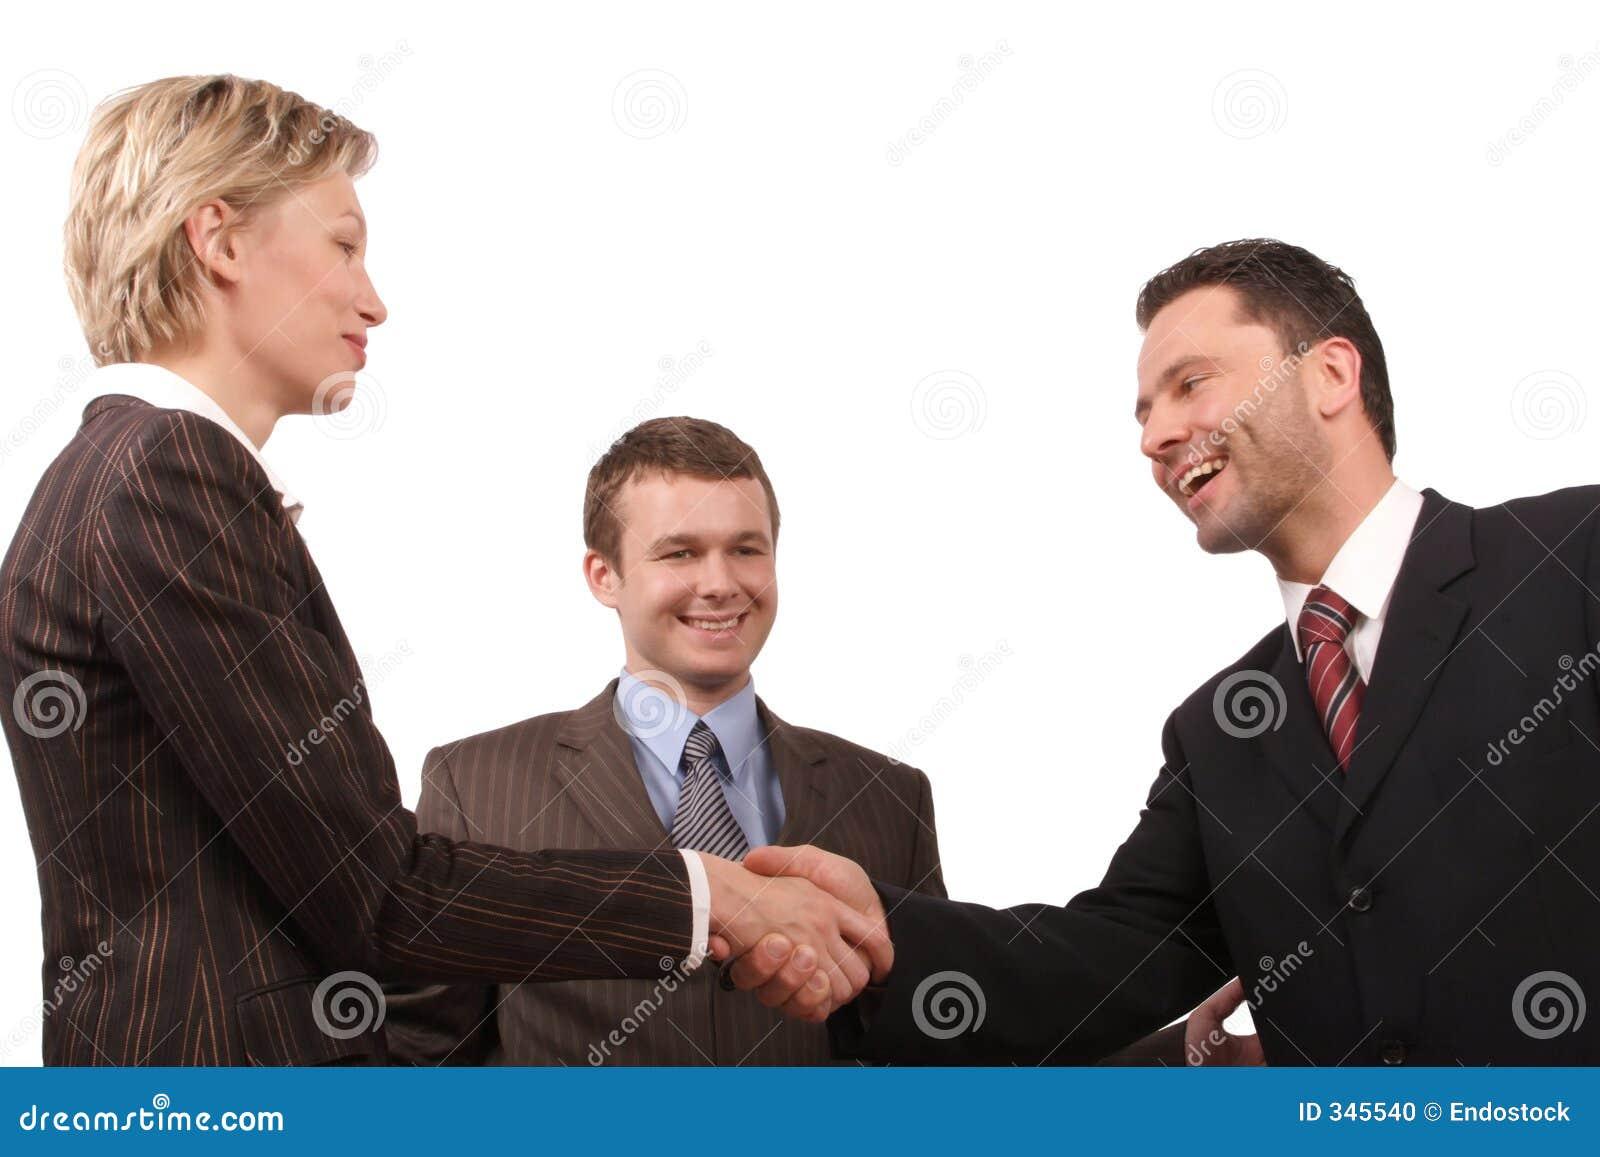 Business Meeting - Man And Woman Handshake Stock Photo - Image: 345540